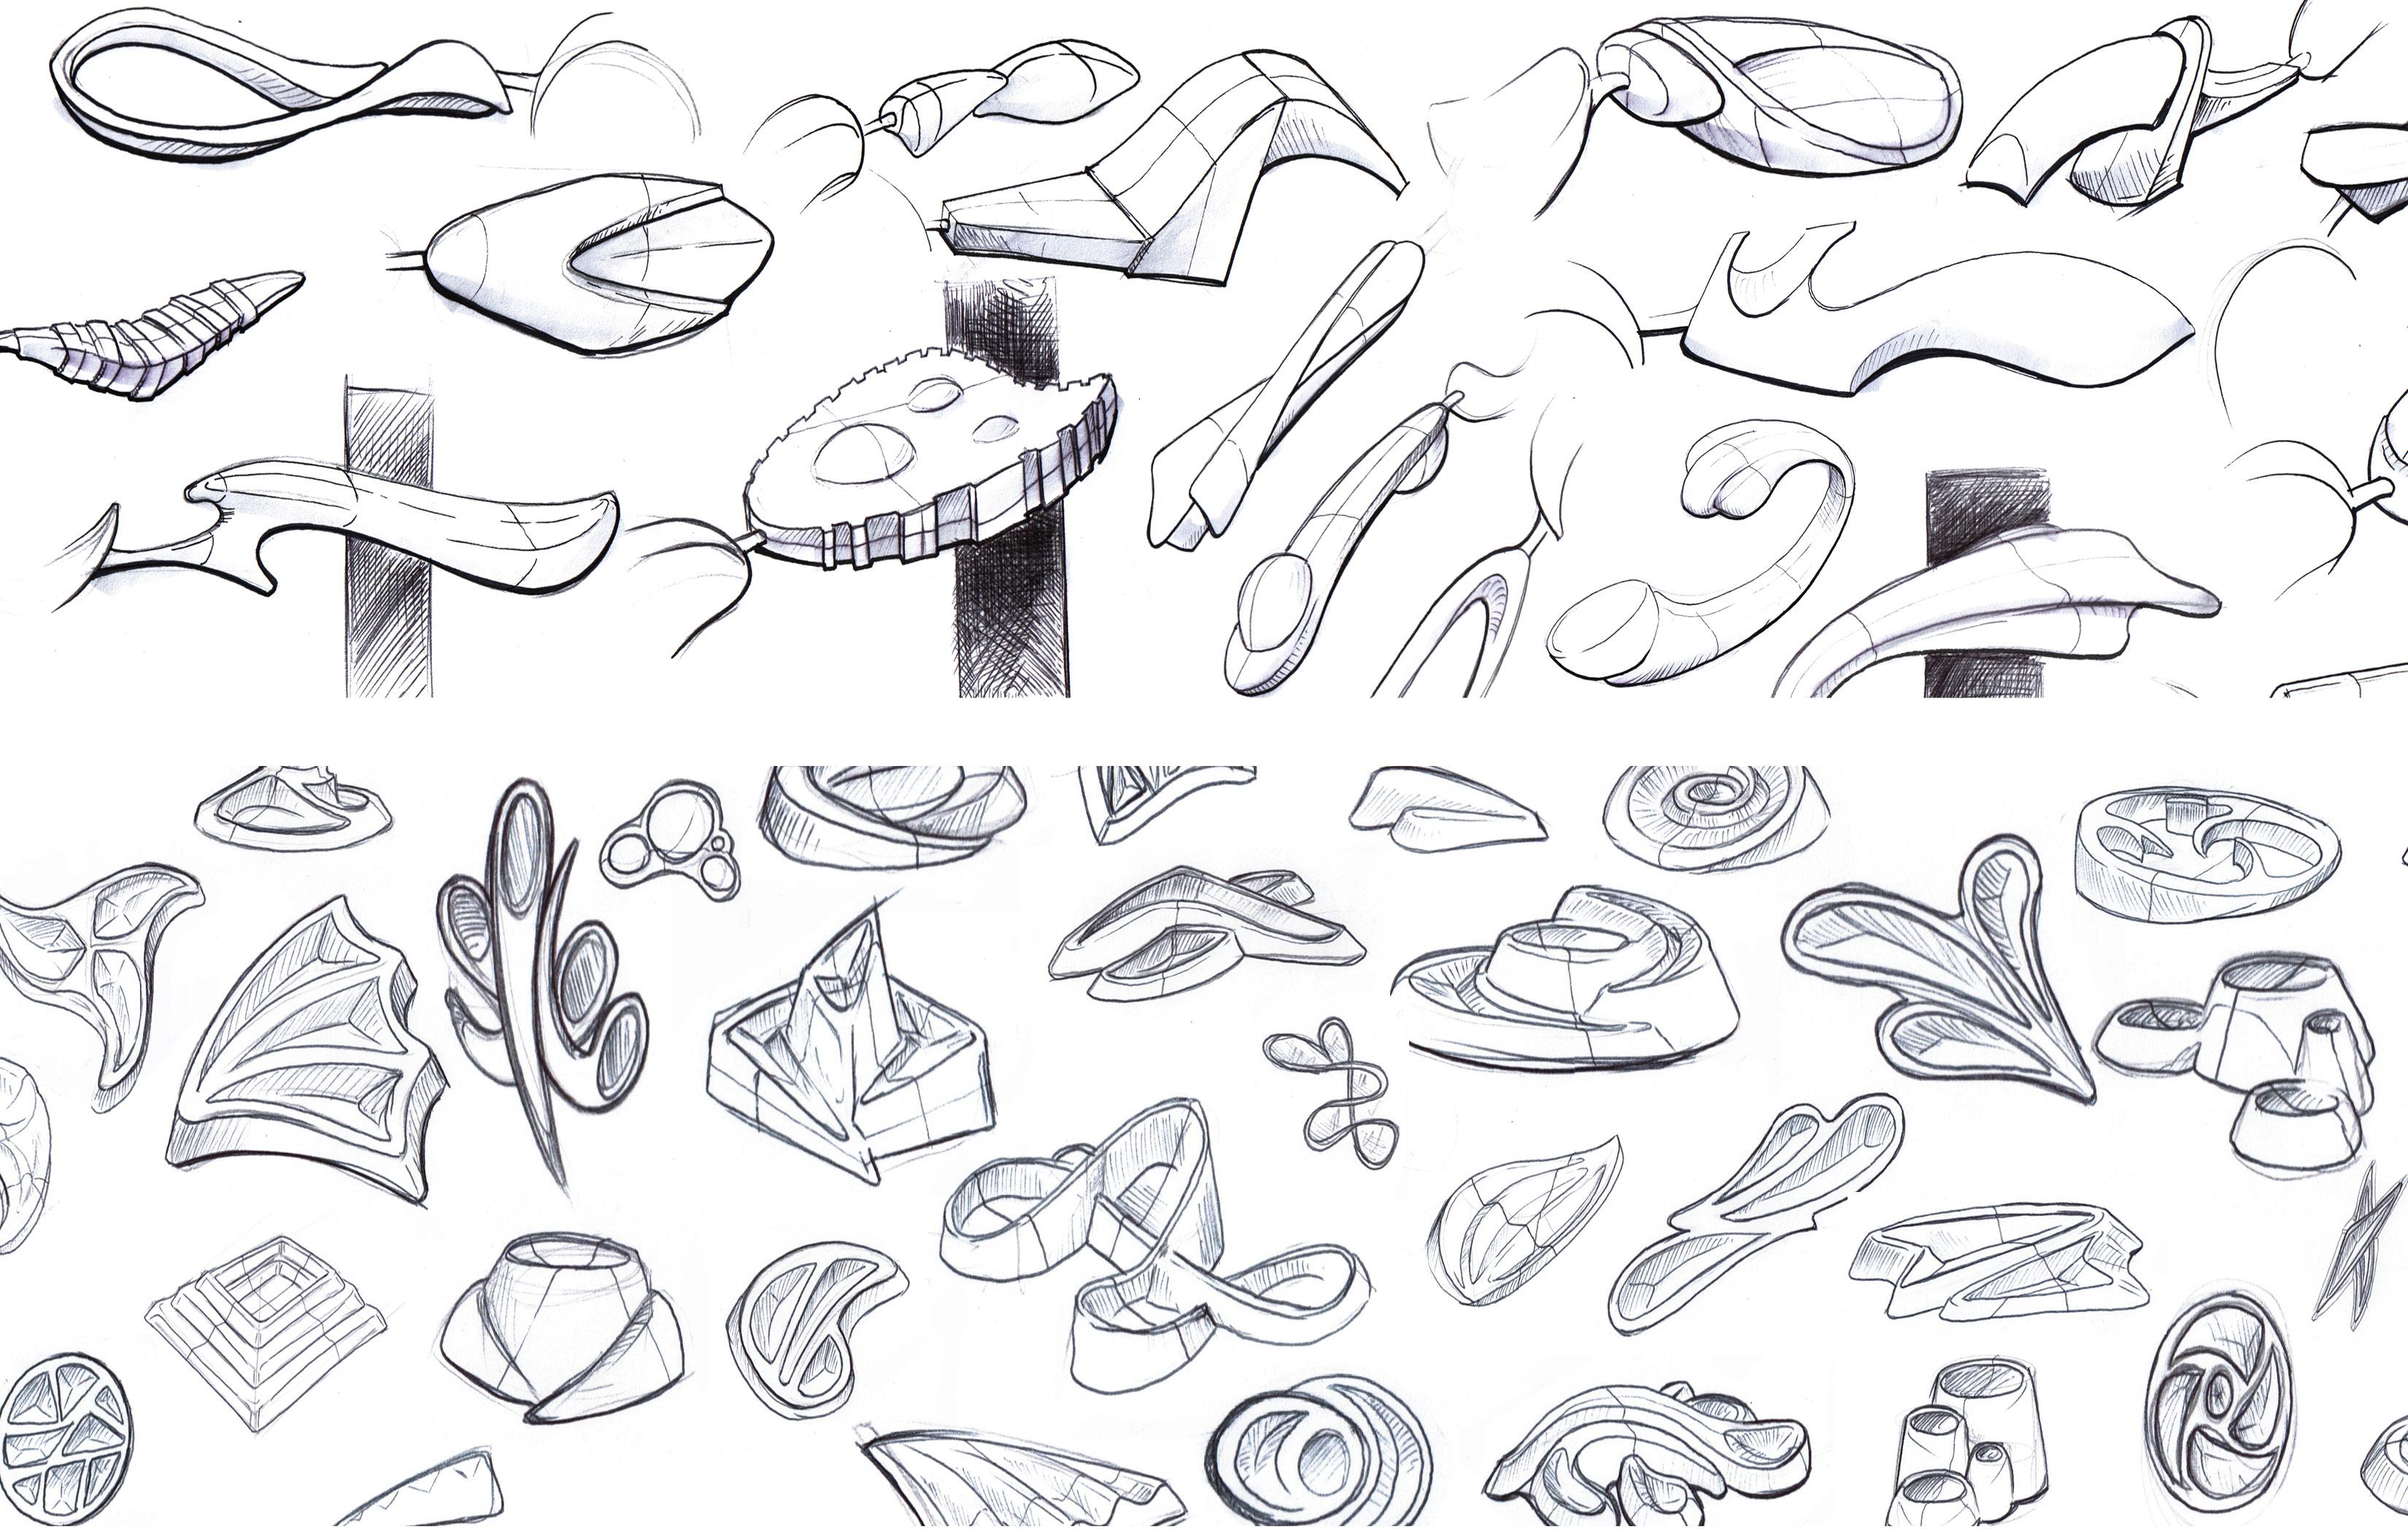 SketchesS1